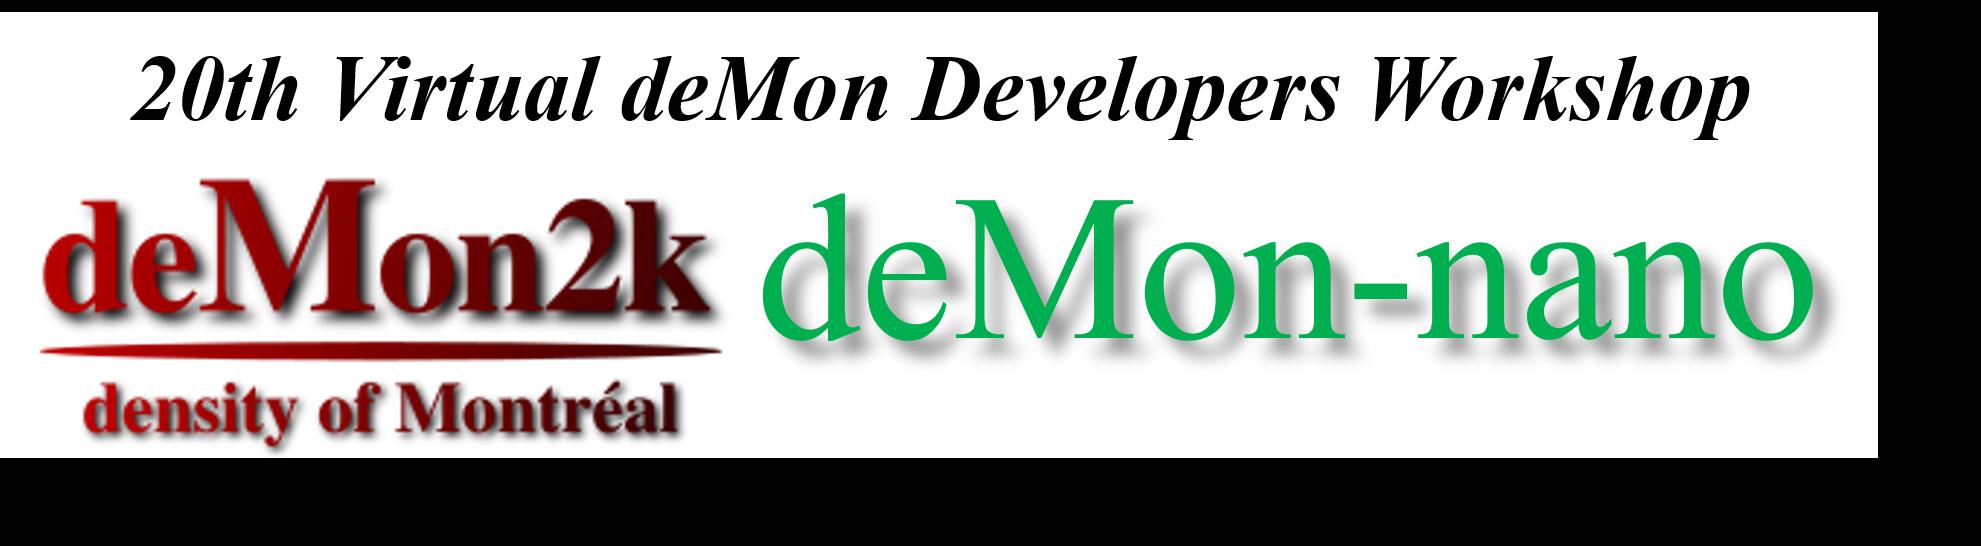 20th Virtual deMon Developers Workshop